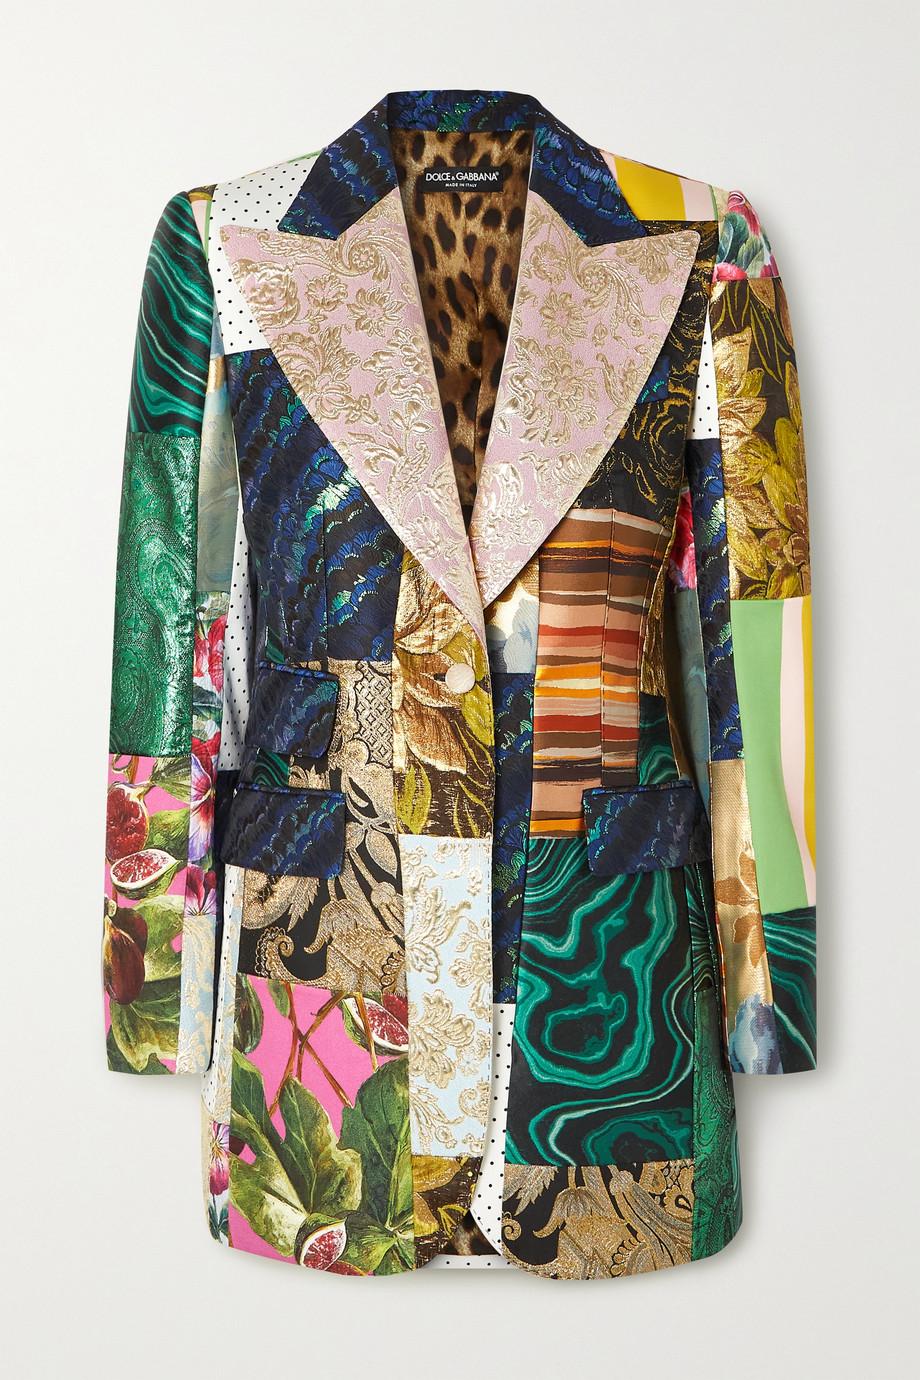 Dolce & Gabbana Patchwork jacquard, brocade and twill blazer